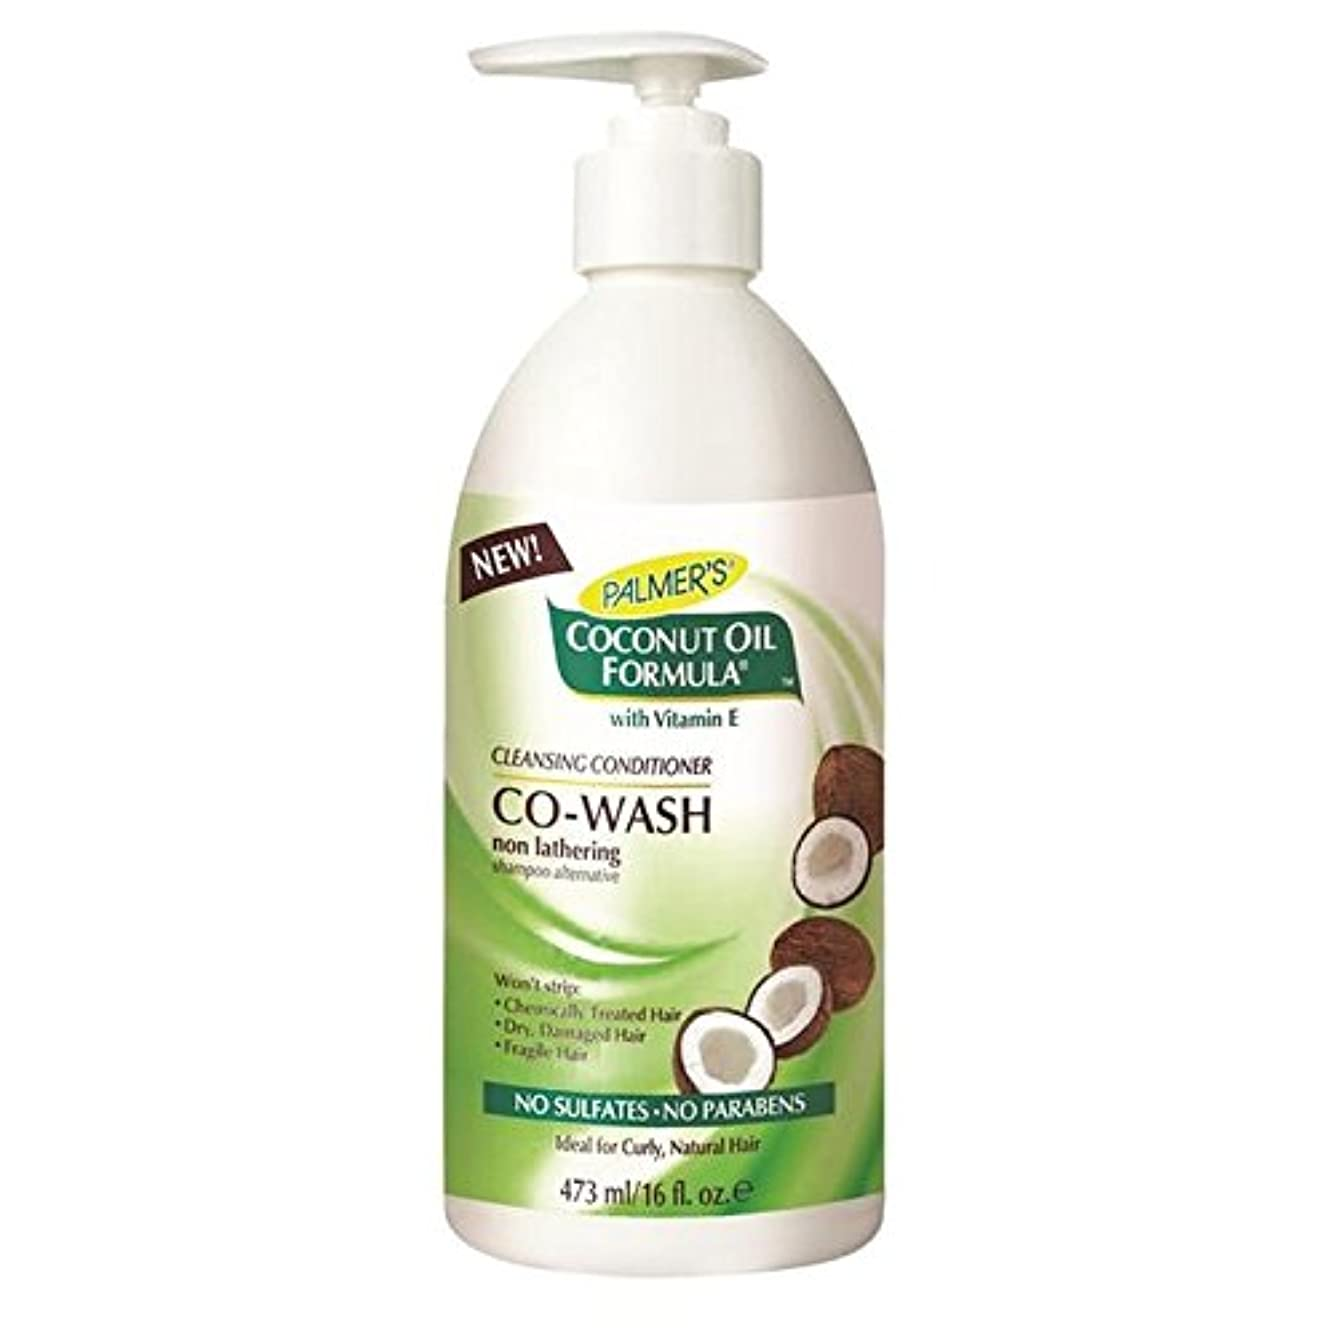 Palmer's Coconut Formula Co-Wash Cleansing Conditioner, Shampoo Alternative 473ml - パーマーのココナッツ式コウォッシュクレンジングコンディショナー...